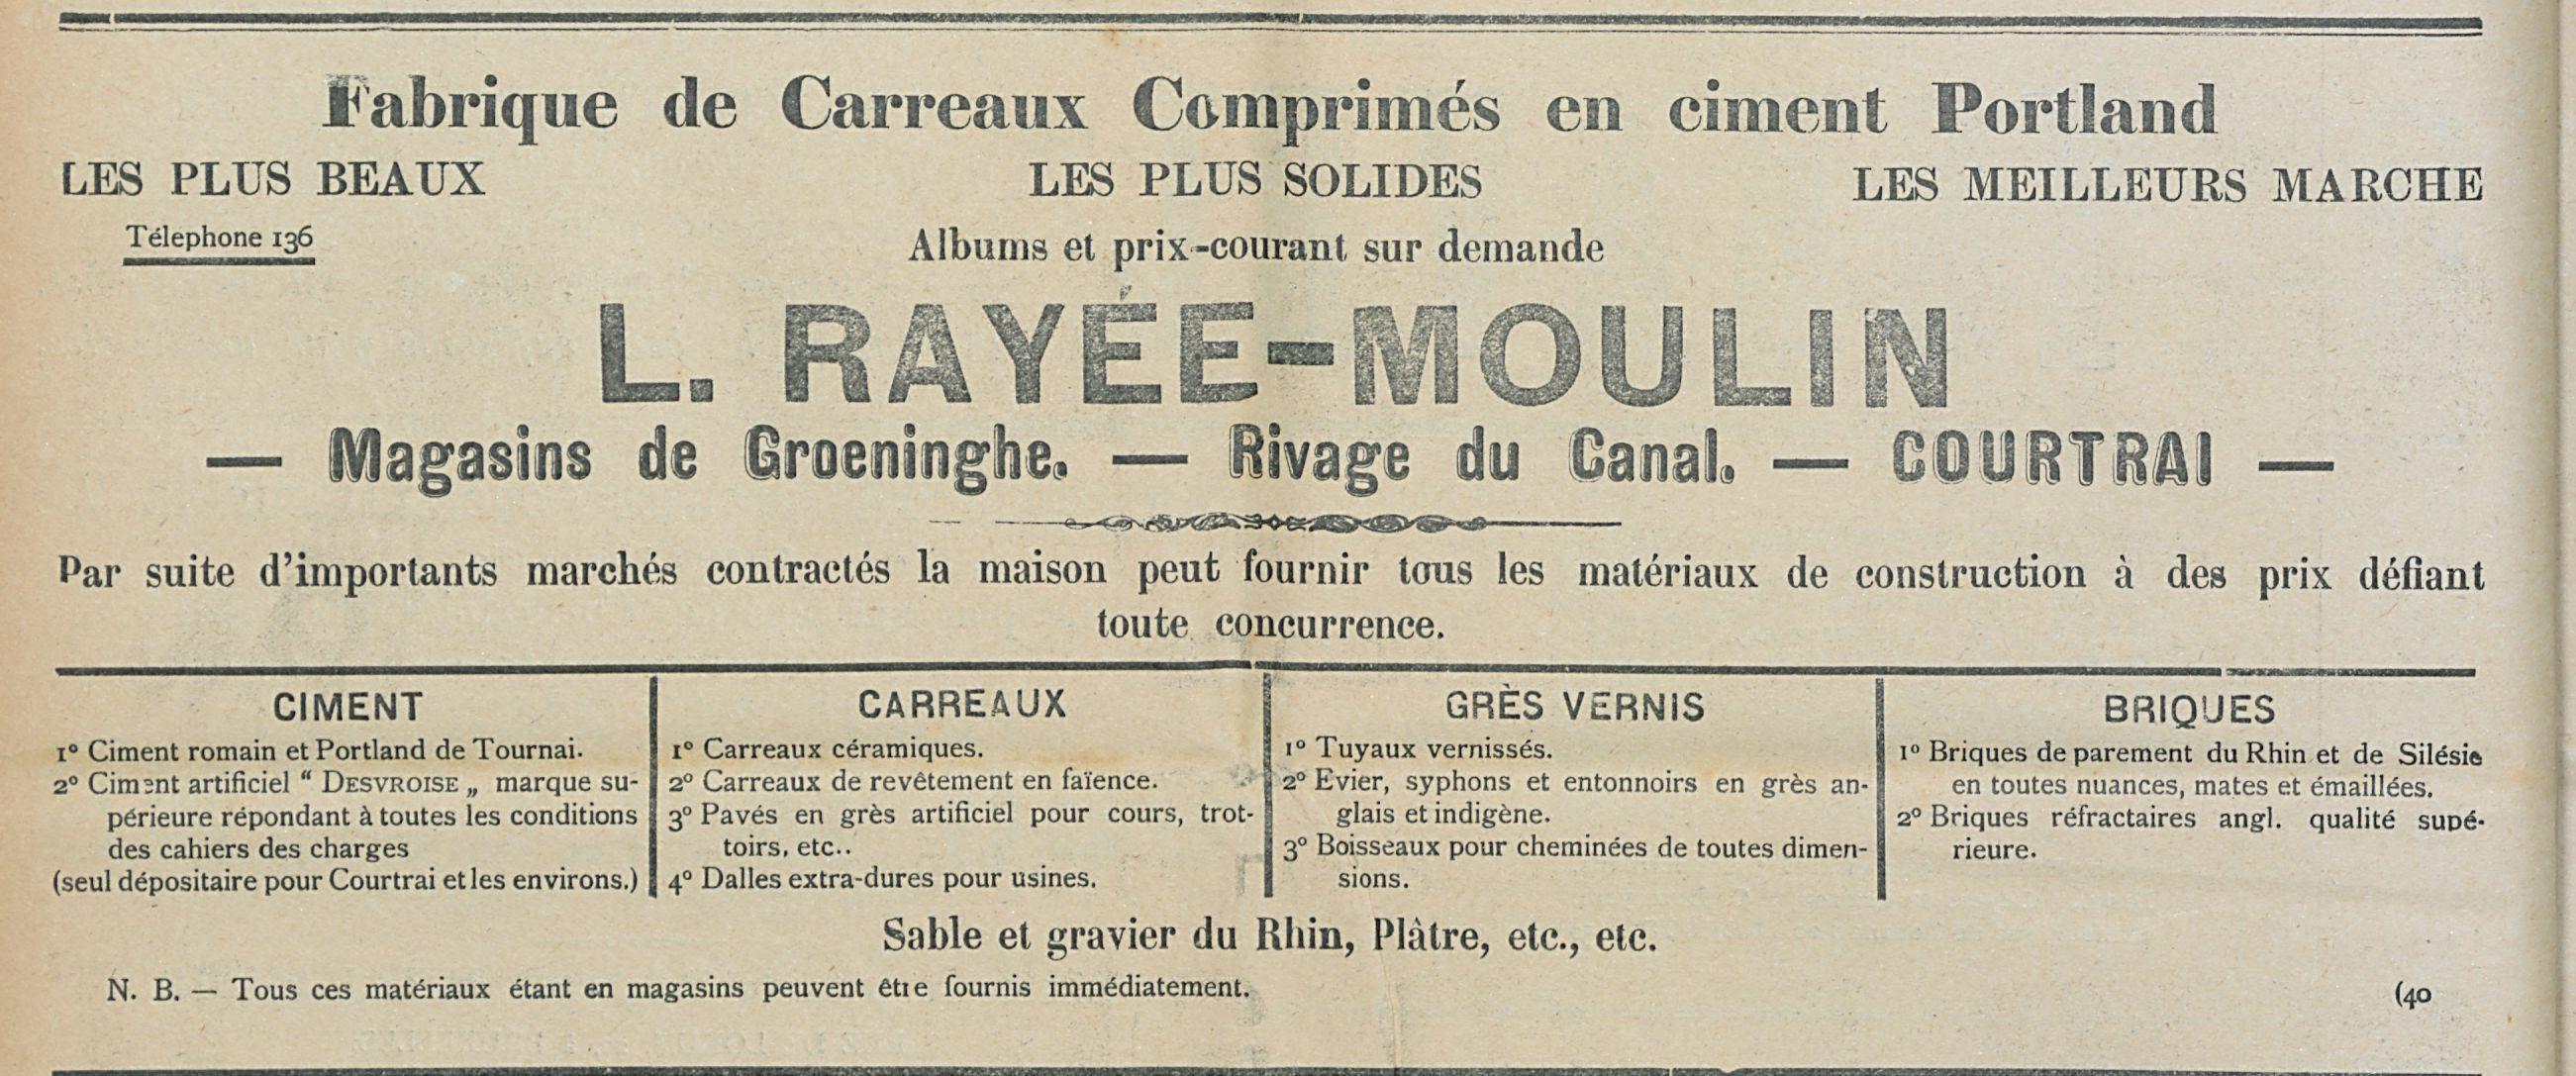 L.RAYEE-MOULIN